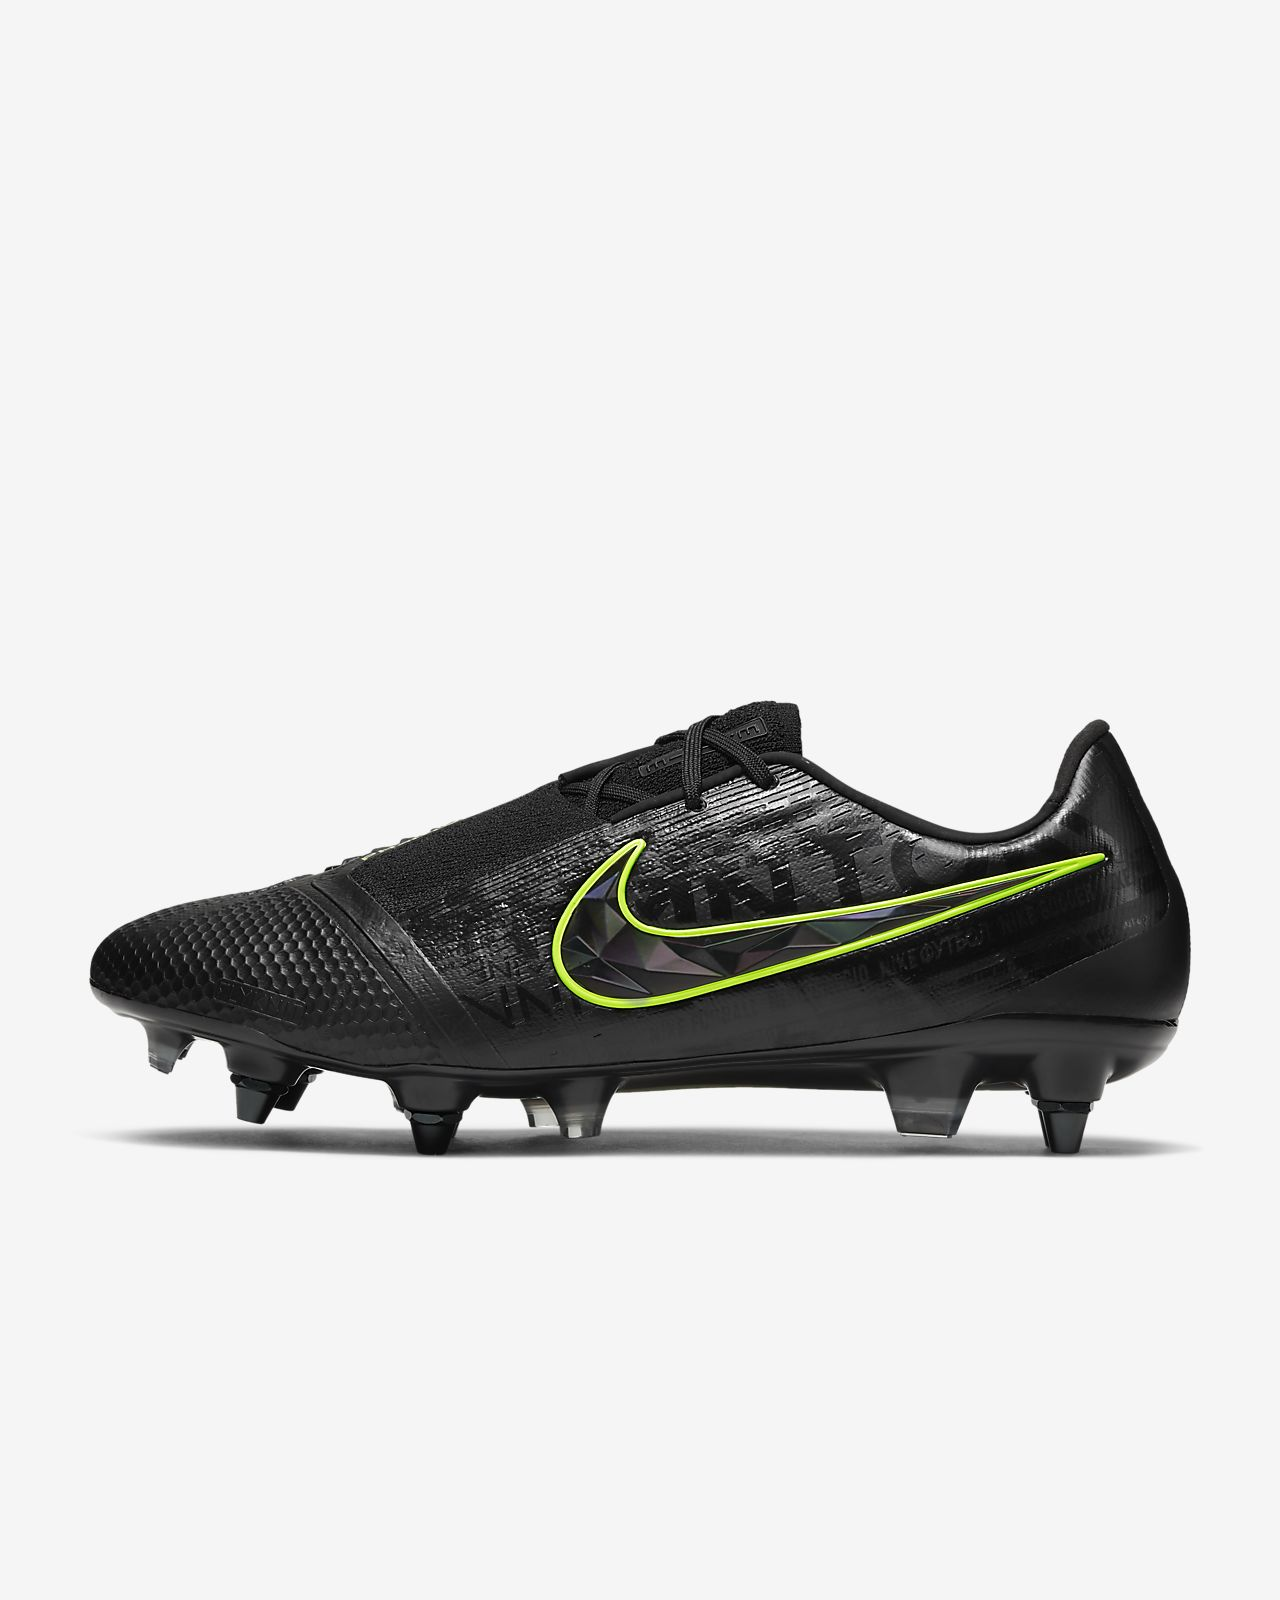 Nike Phantom Venom Elite SG Pro Anti Clog Traction Soft Ground Football Boot